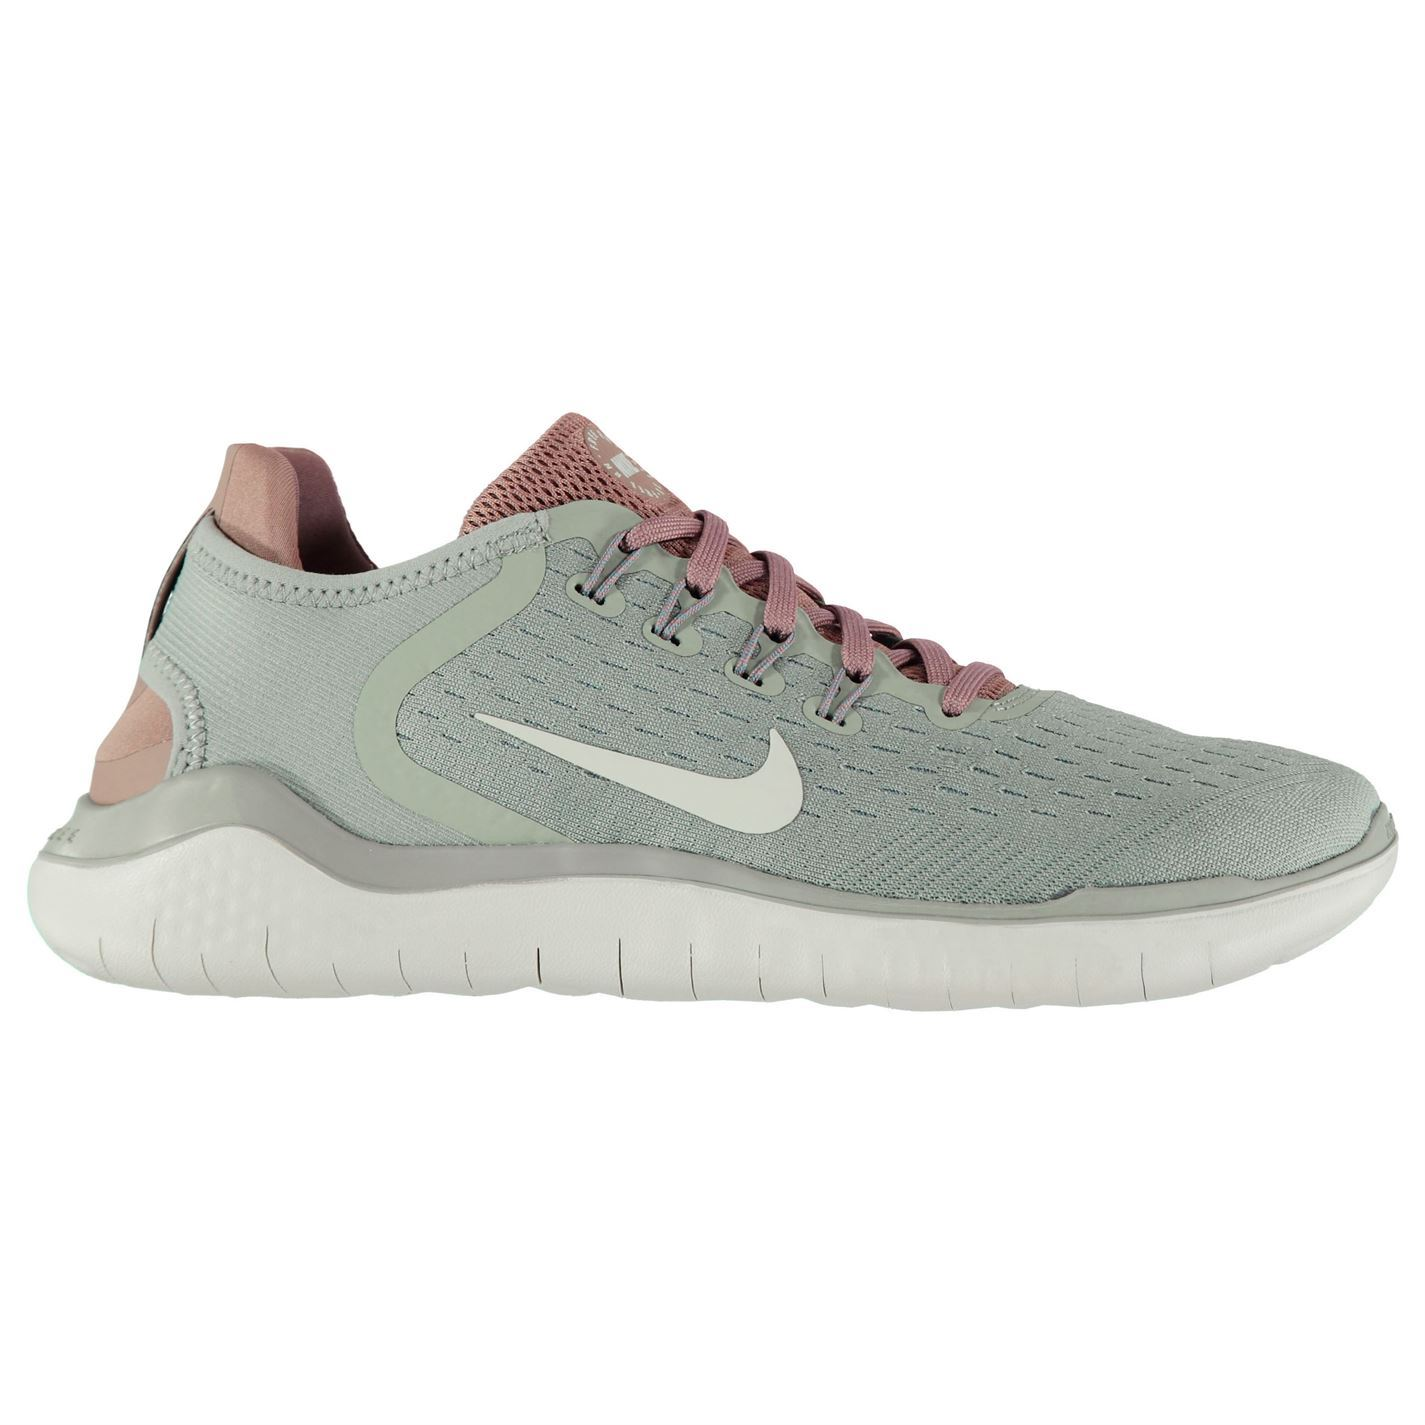 17 Best nike air pegasus running shoes nikesportscheap4sale